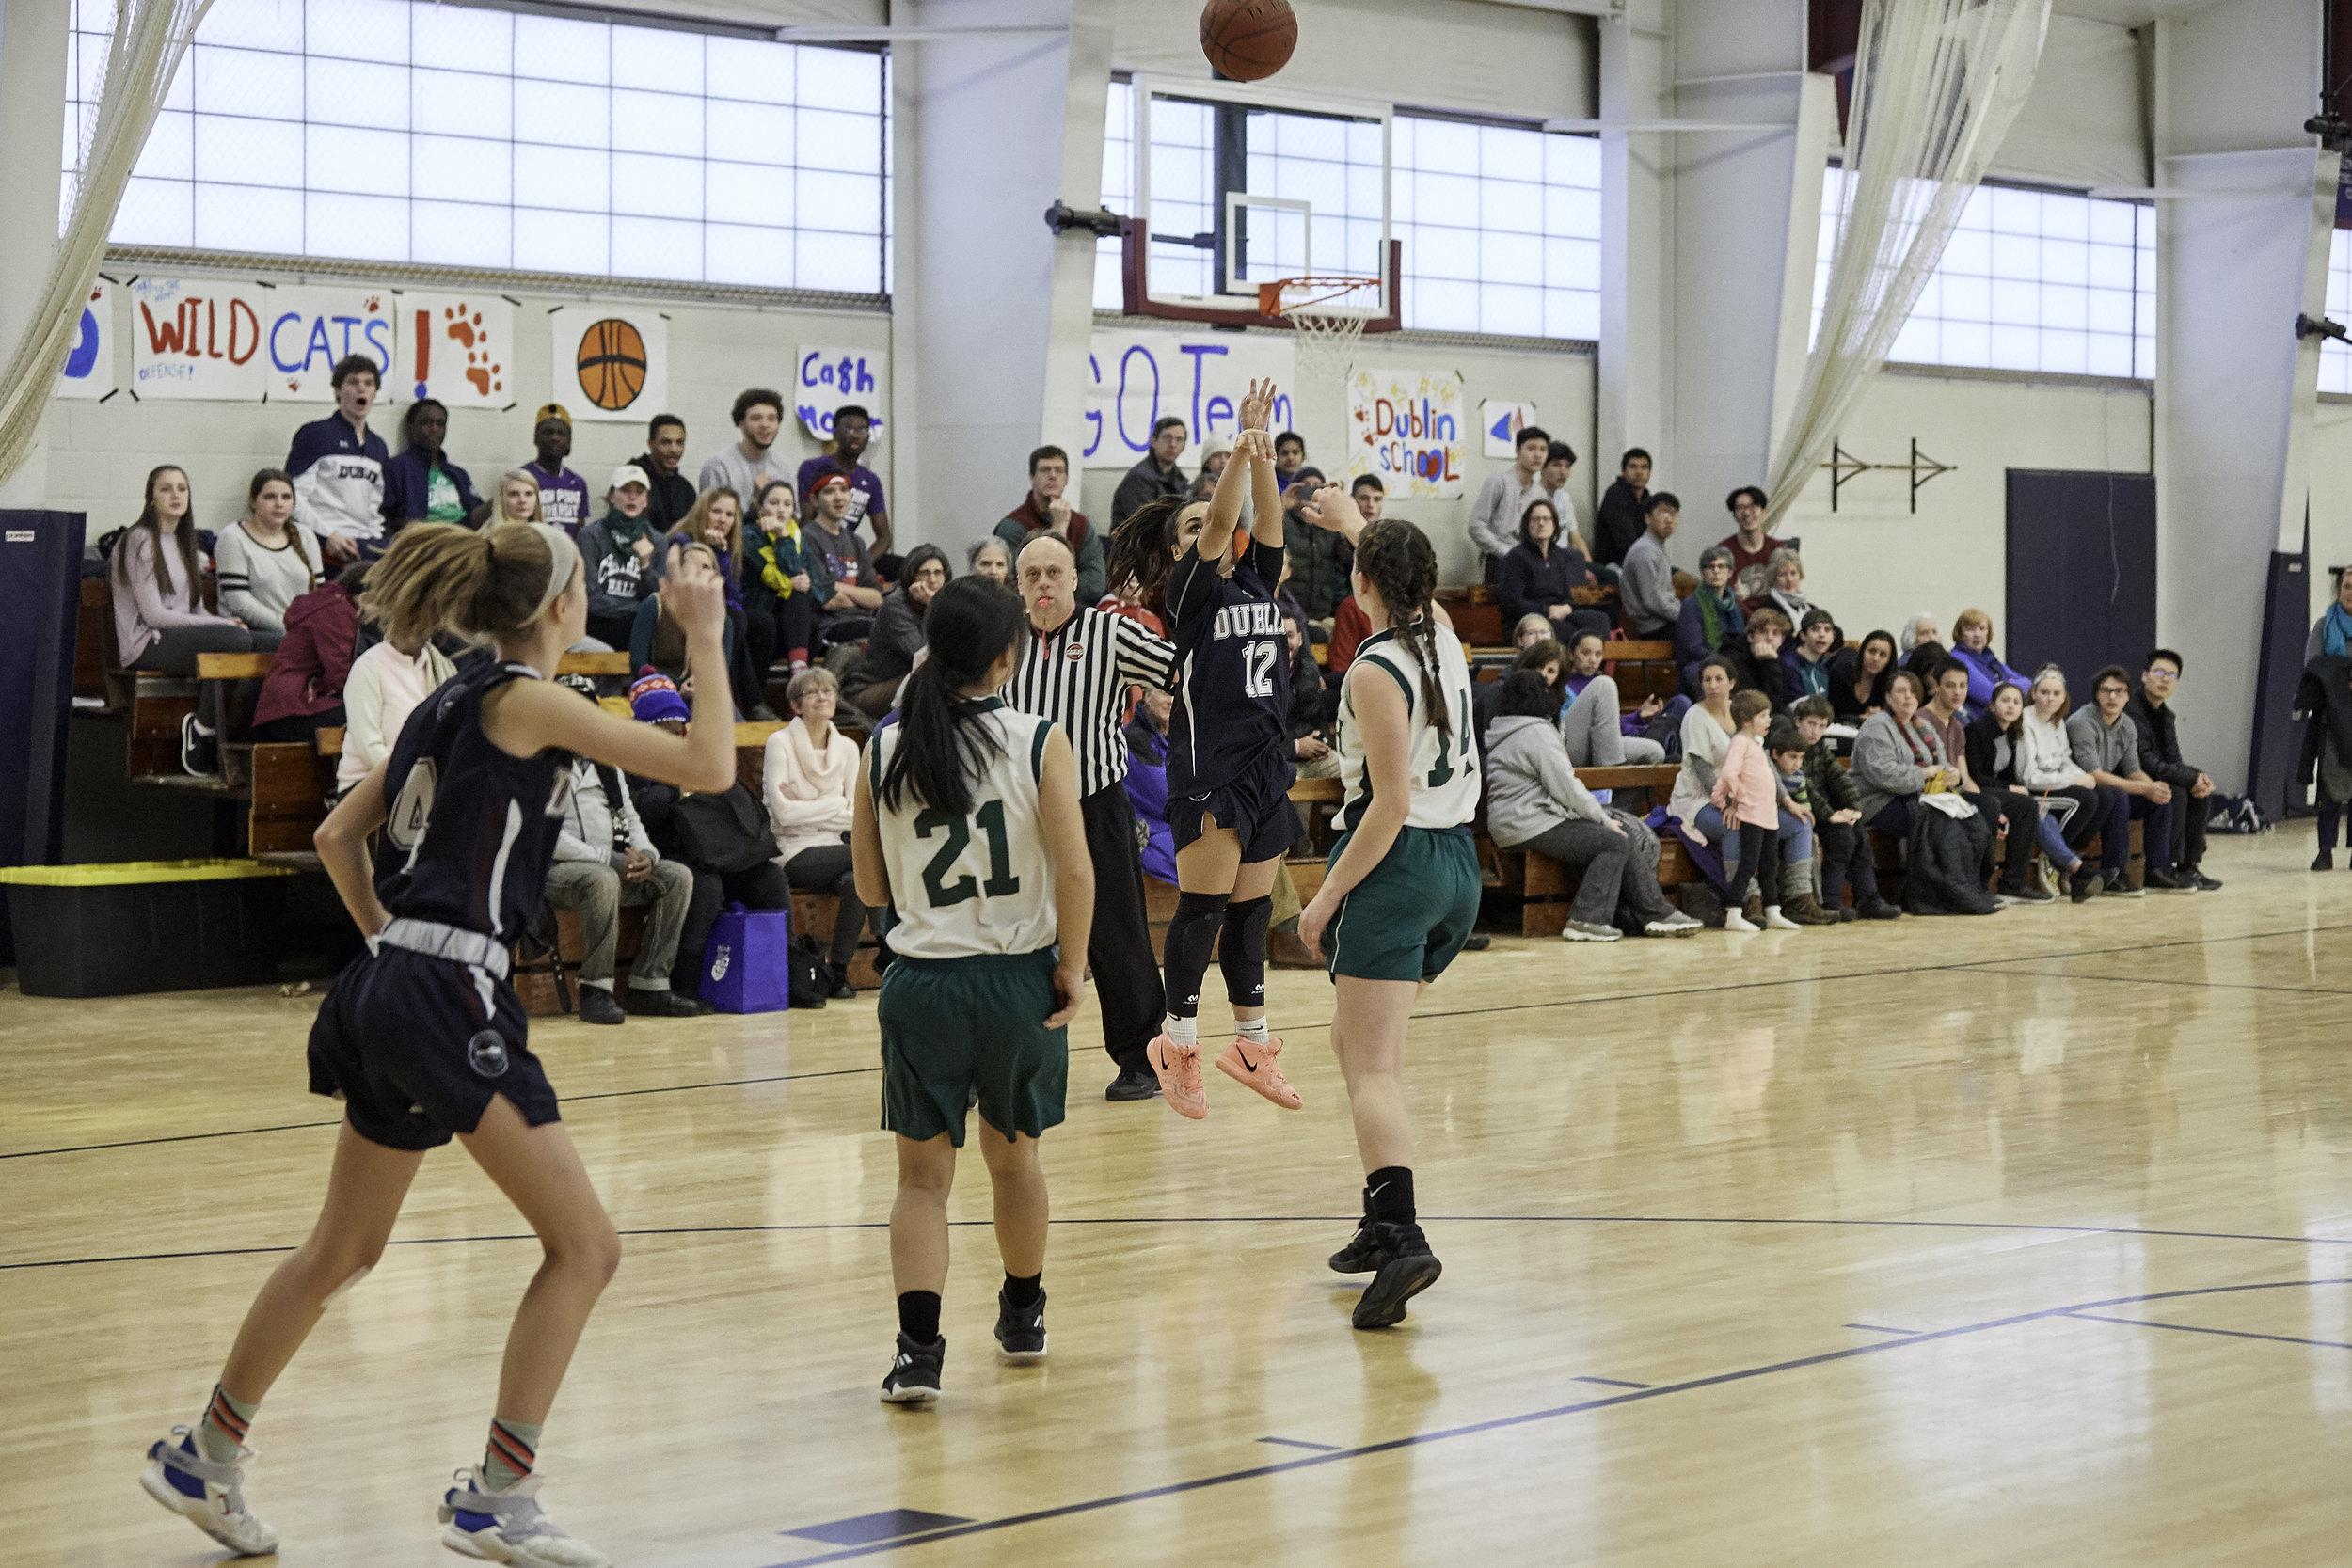 Basketball vs High Mowing School, February 2, 2019 - 166425.jpg